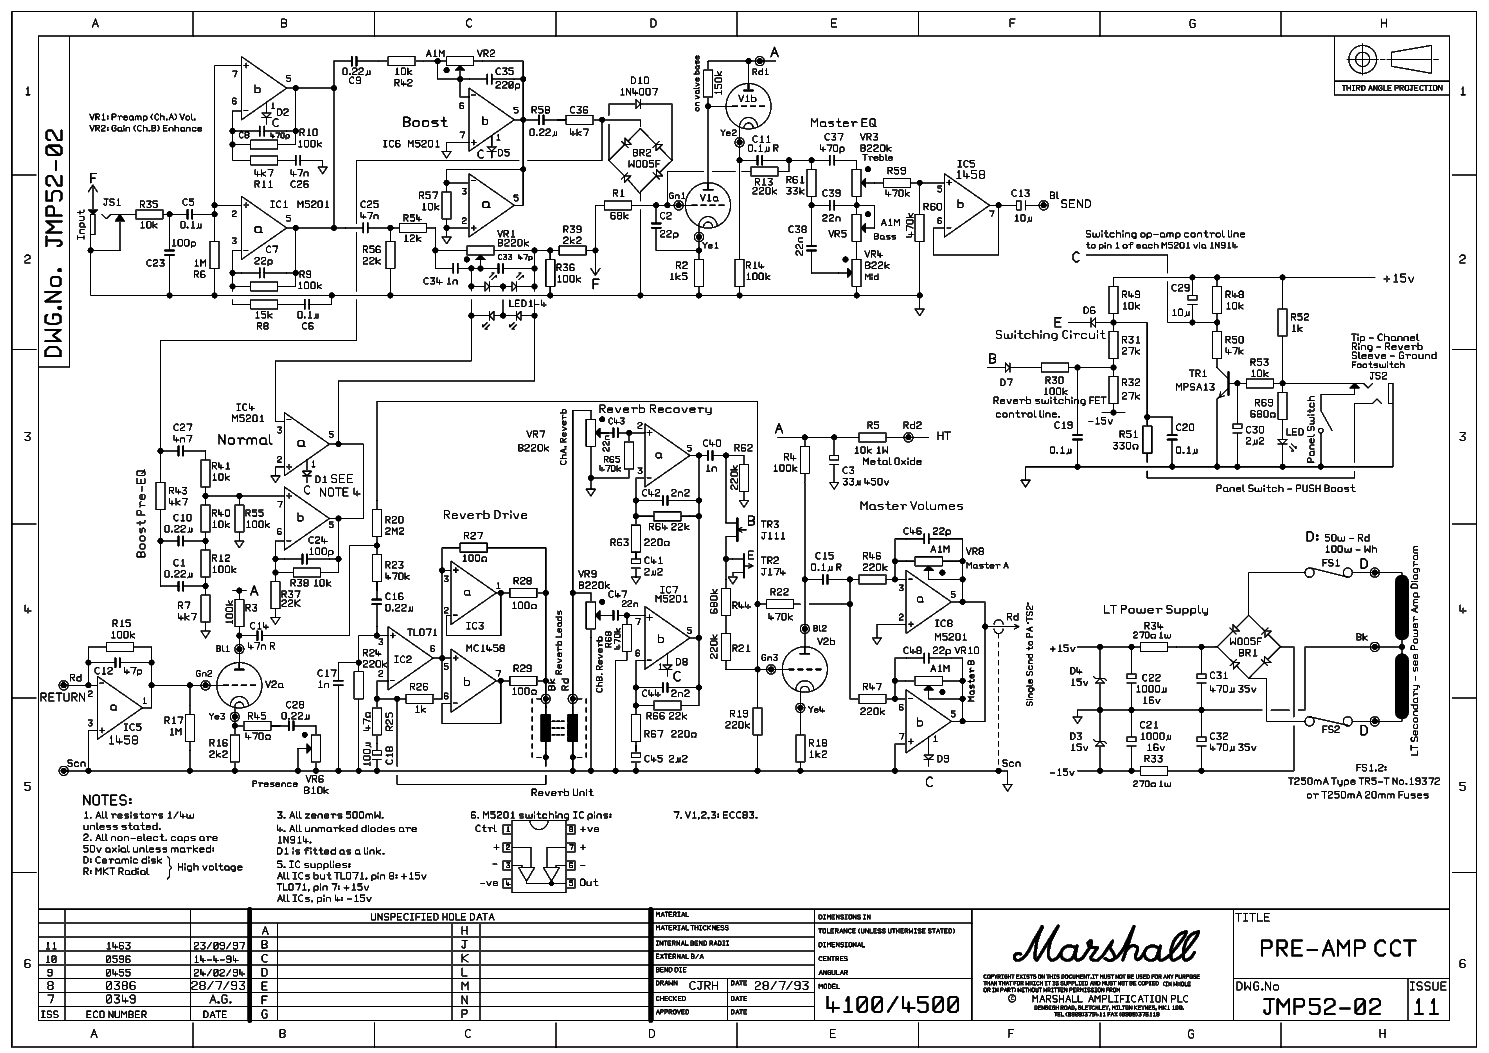 Jcm 900 Schematic Pdf Wiring Diagram Services R33 Marshall Download Diagrams U2022 Rh Wiringdiagramblog Today